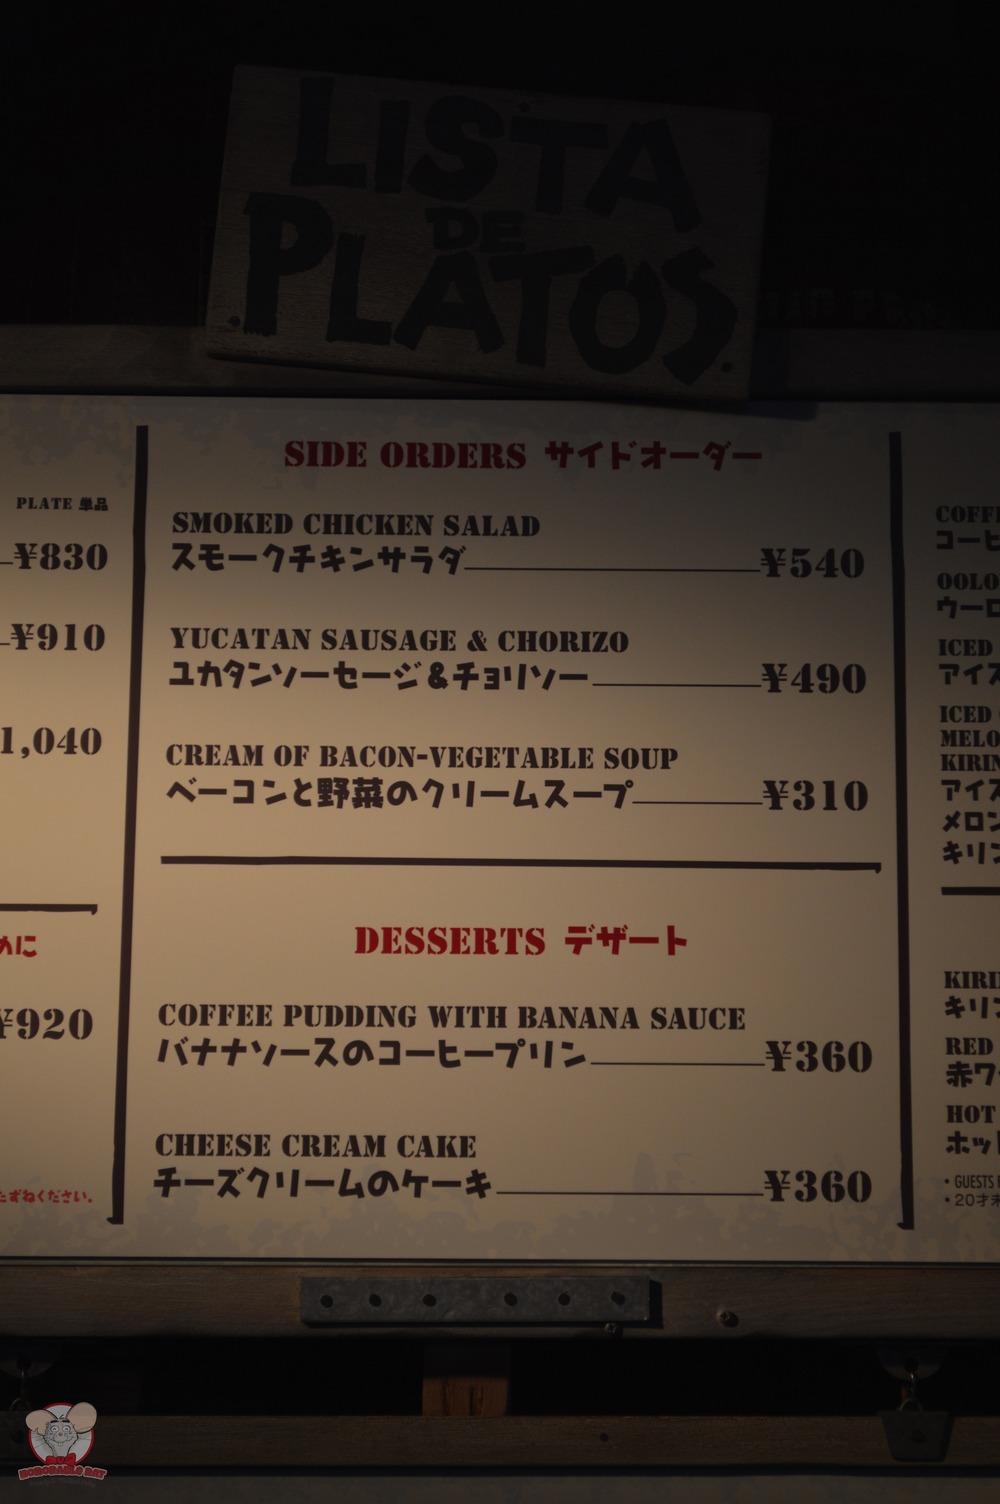 Side Orders & Desserts